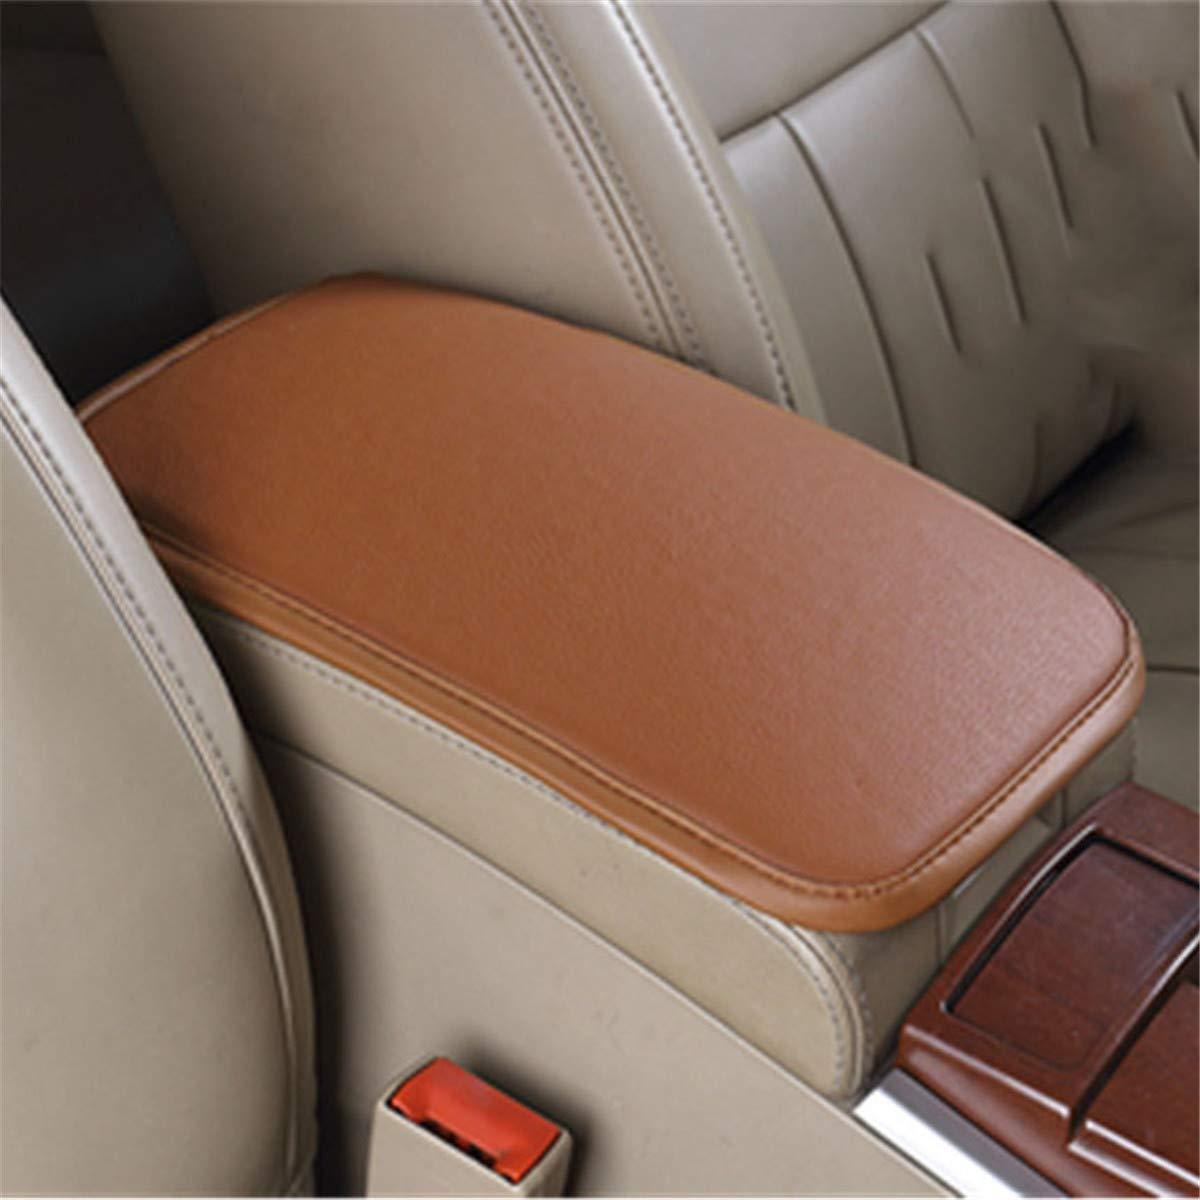 7126388c0a50 LKXHarleya Car Center Console Cover, Universal Car Armrest Cover, PU ...